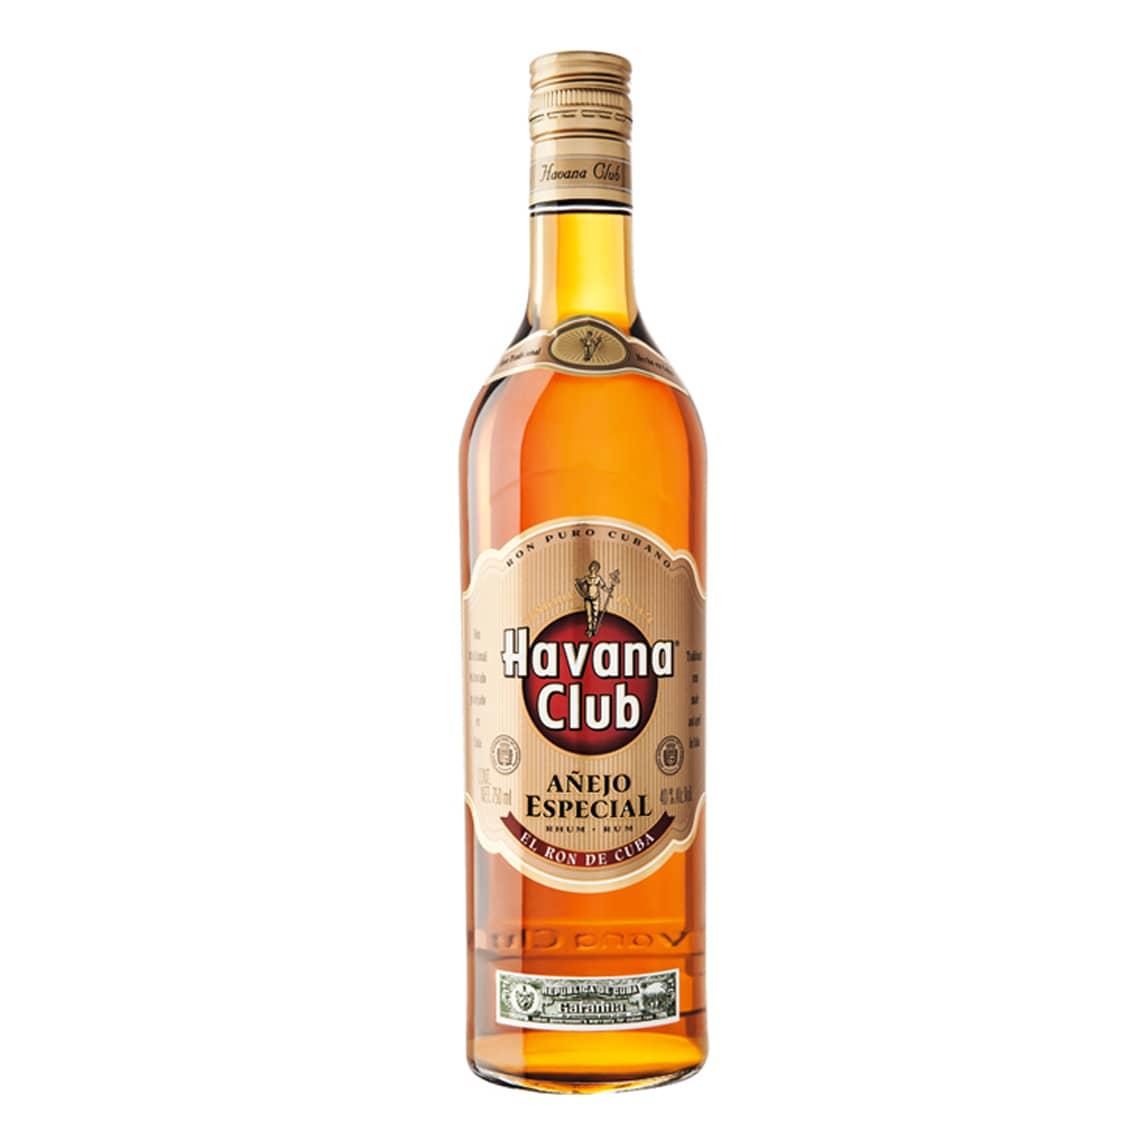 Ron HAVANA CLUB Añejo Especial Botella 750ml